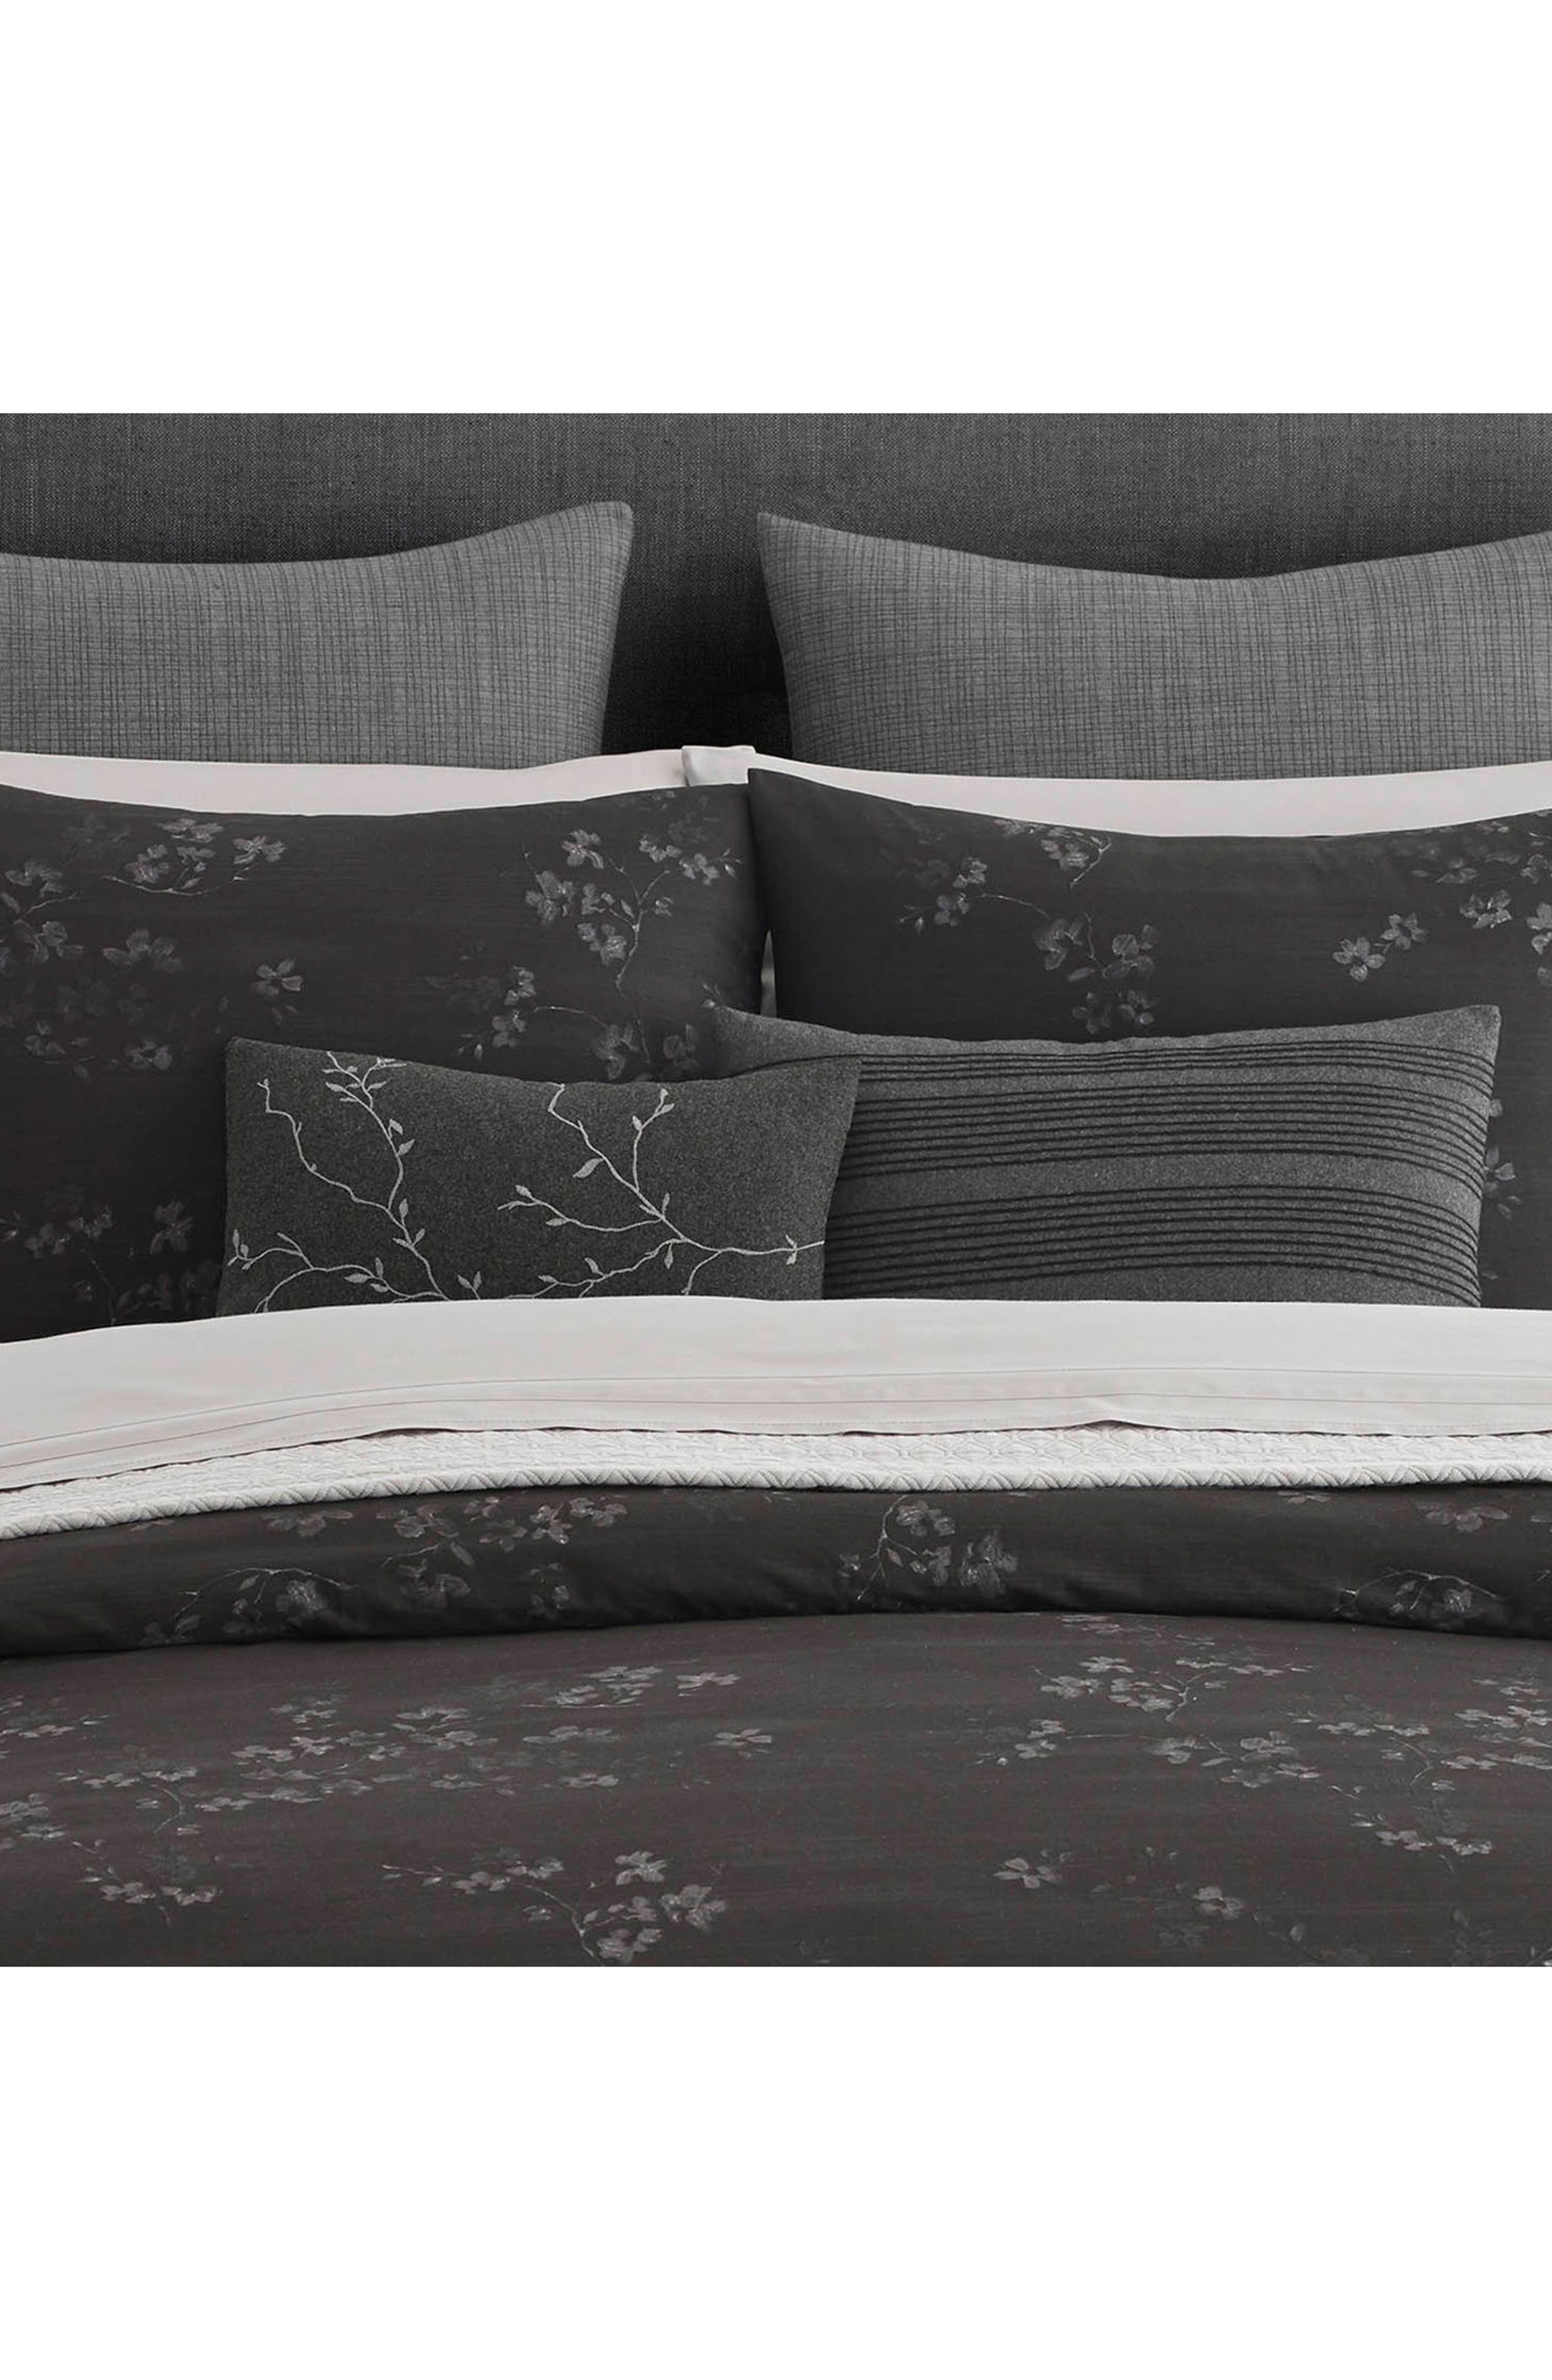 Charcoal Floral Vine Accent Pillow,                             Alternate thumbnail 2, color,                             Dark Gray